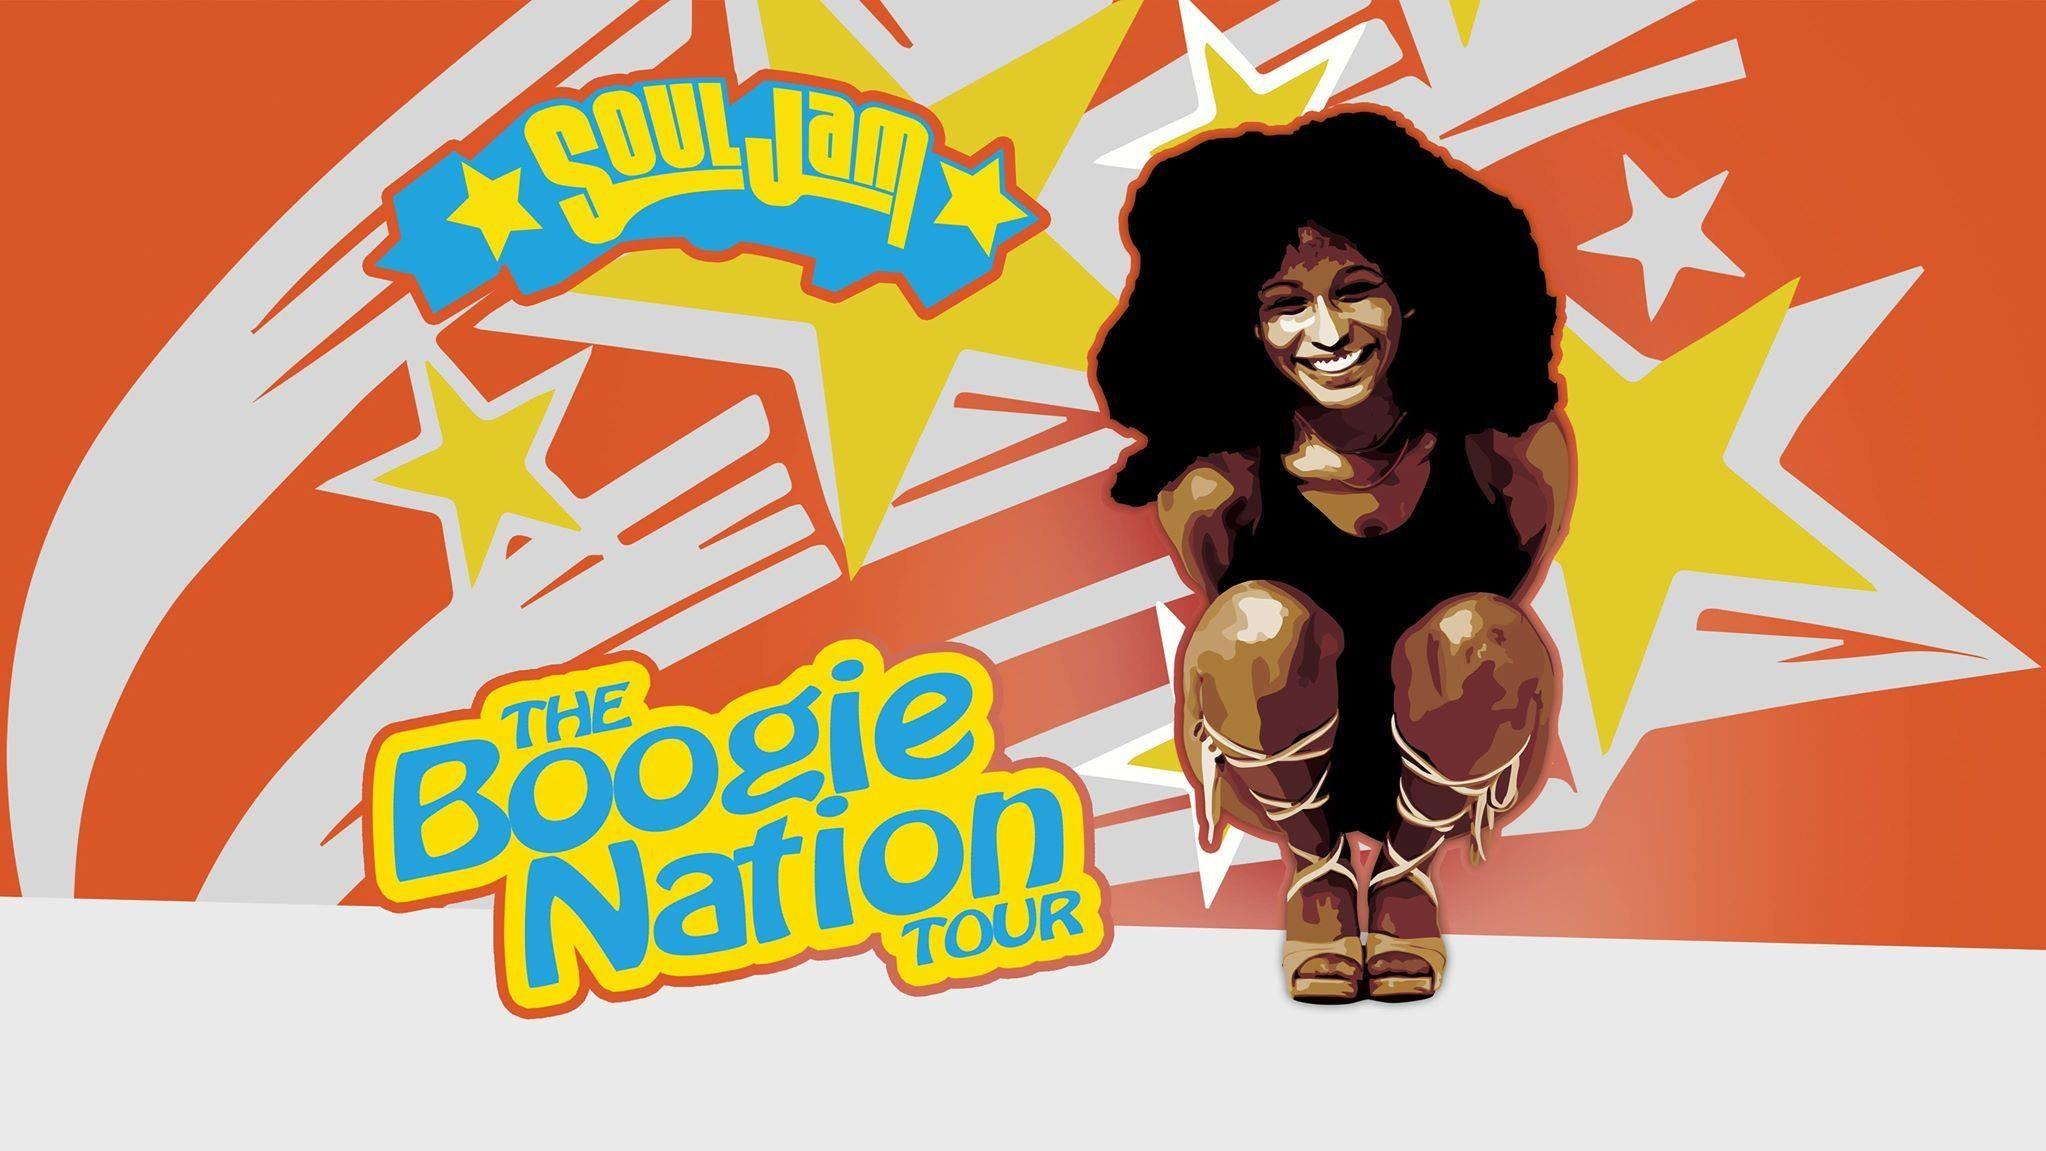 SoulJam / The Boogie Nation Tour / Manchester